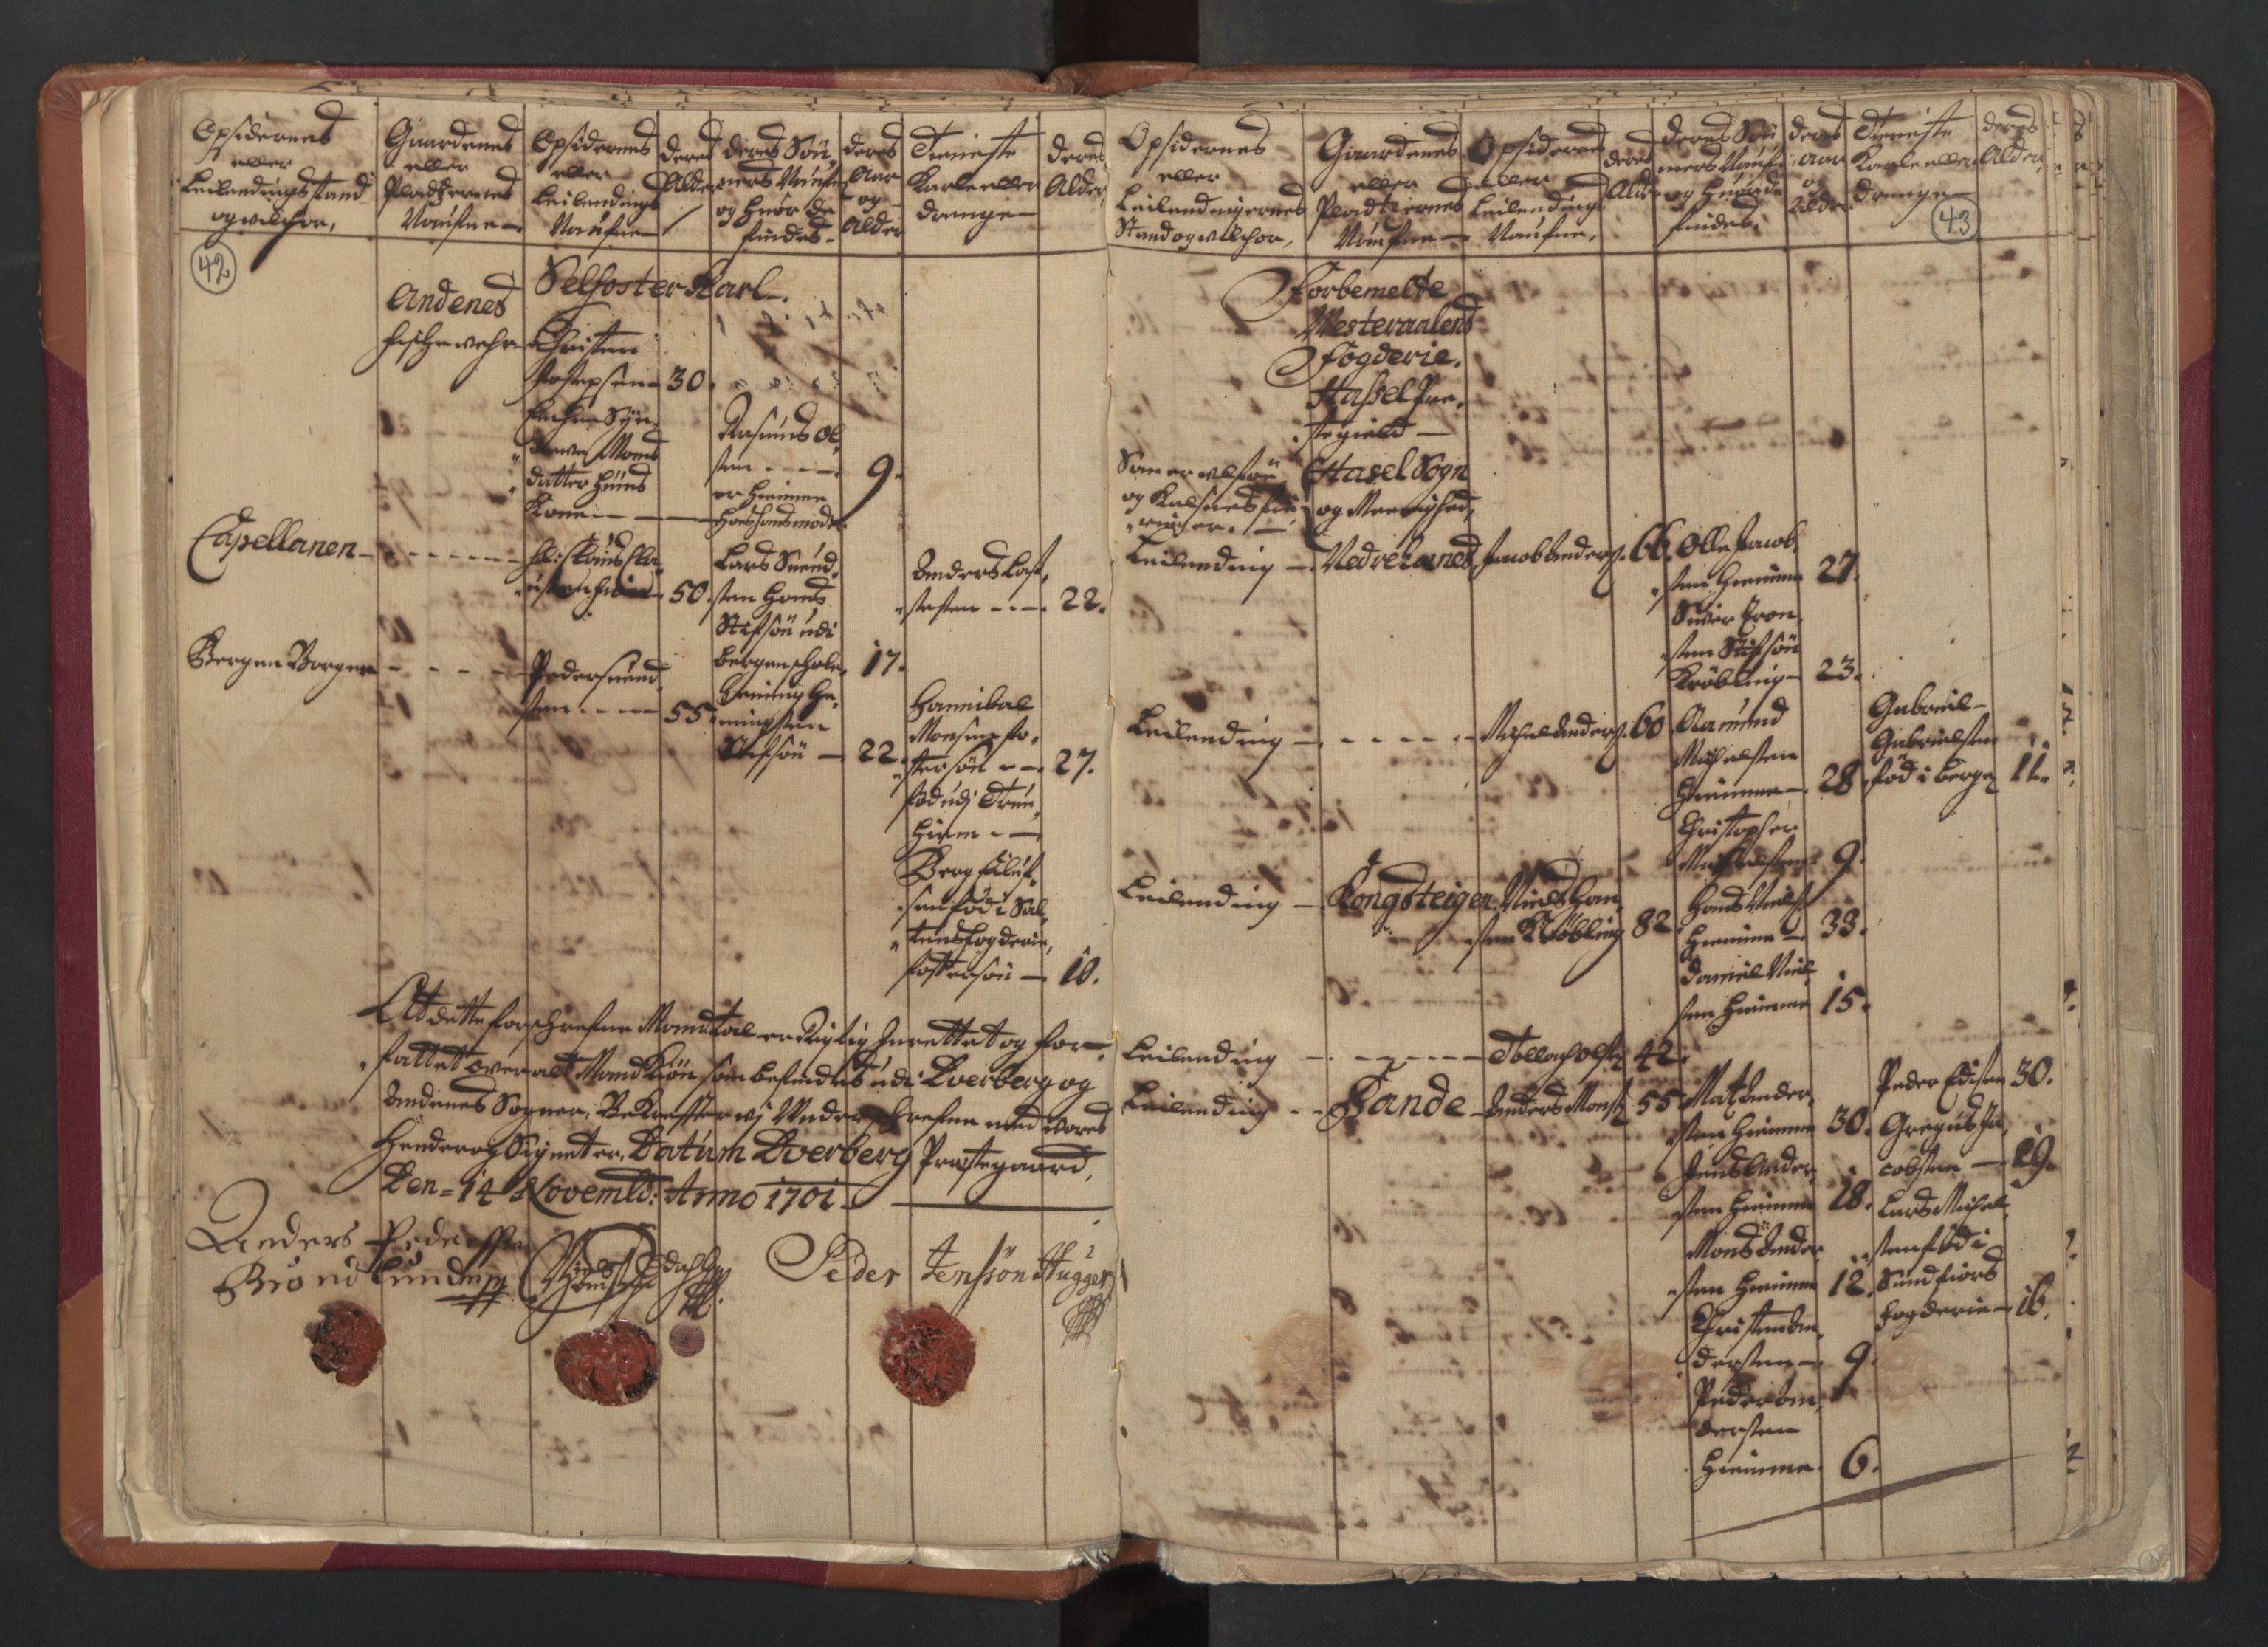 RA, Manntallet 1701, nr. 18: Vesterålen, Andenes og Lofoten fogderi, 1701, s. 42-43